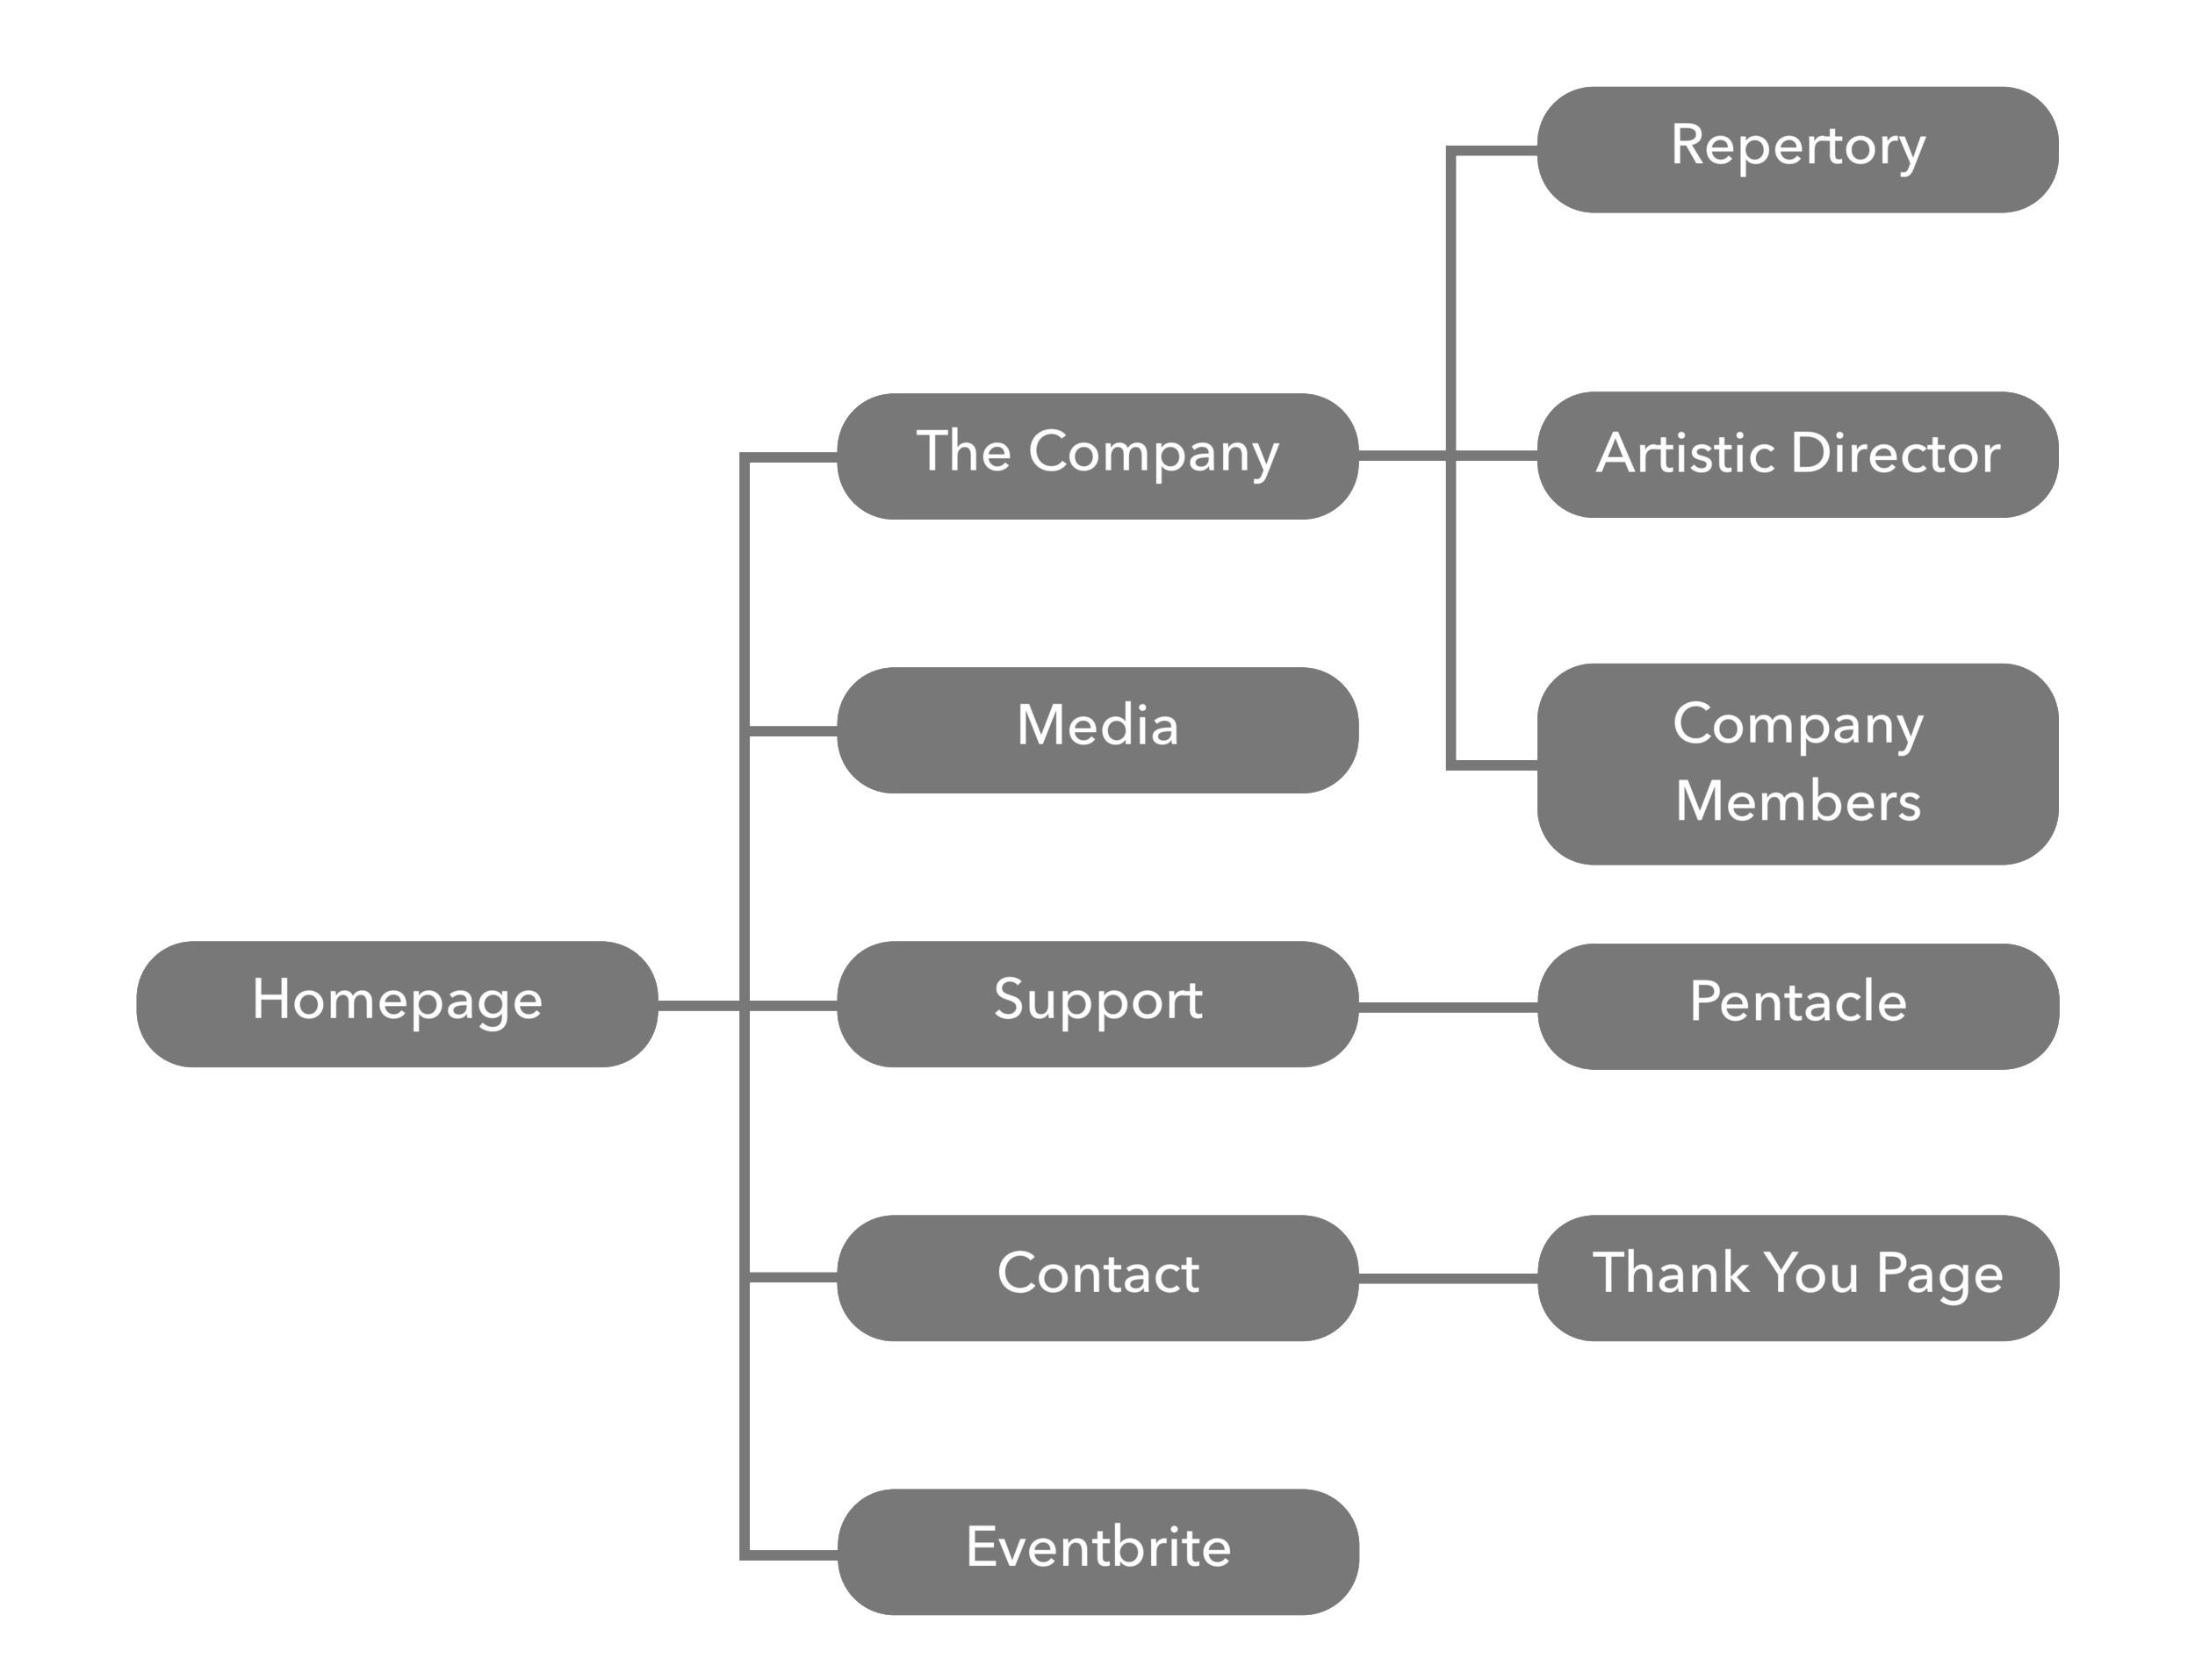 soluq-information-architecture.jpg